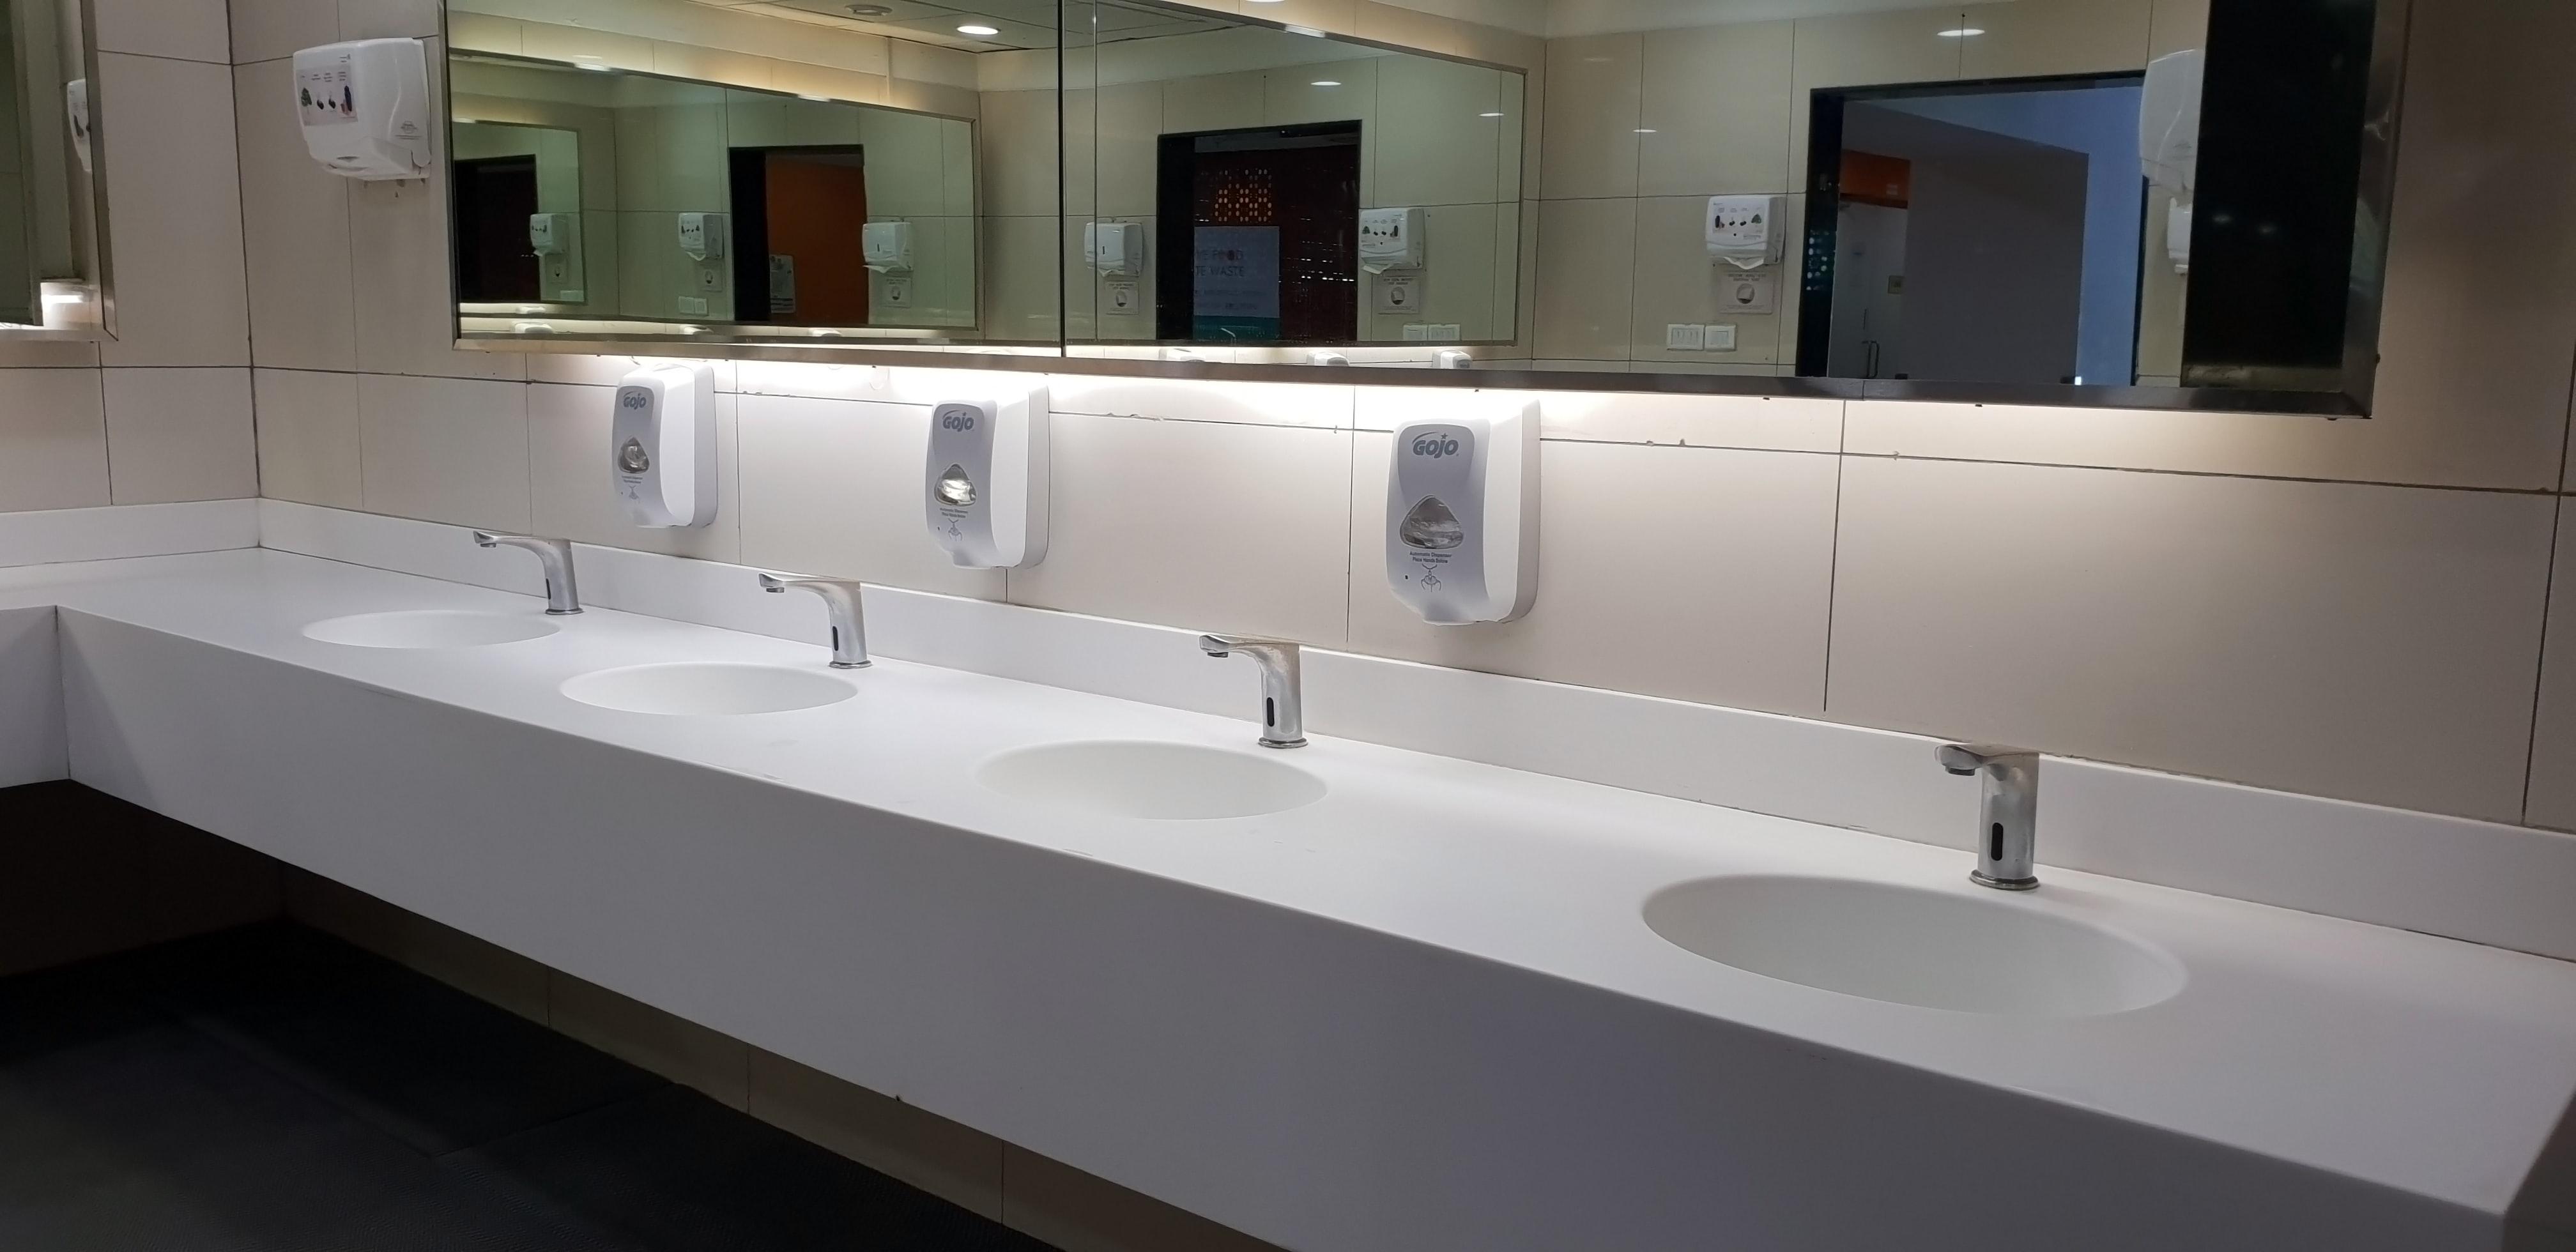 four public restroom sinks